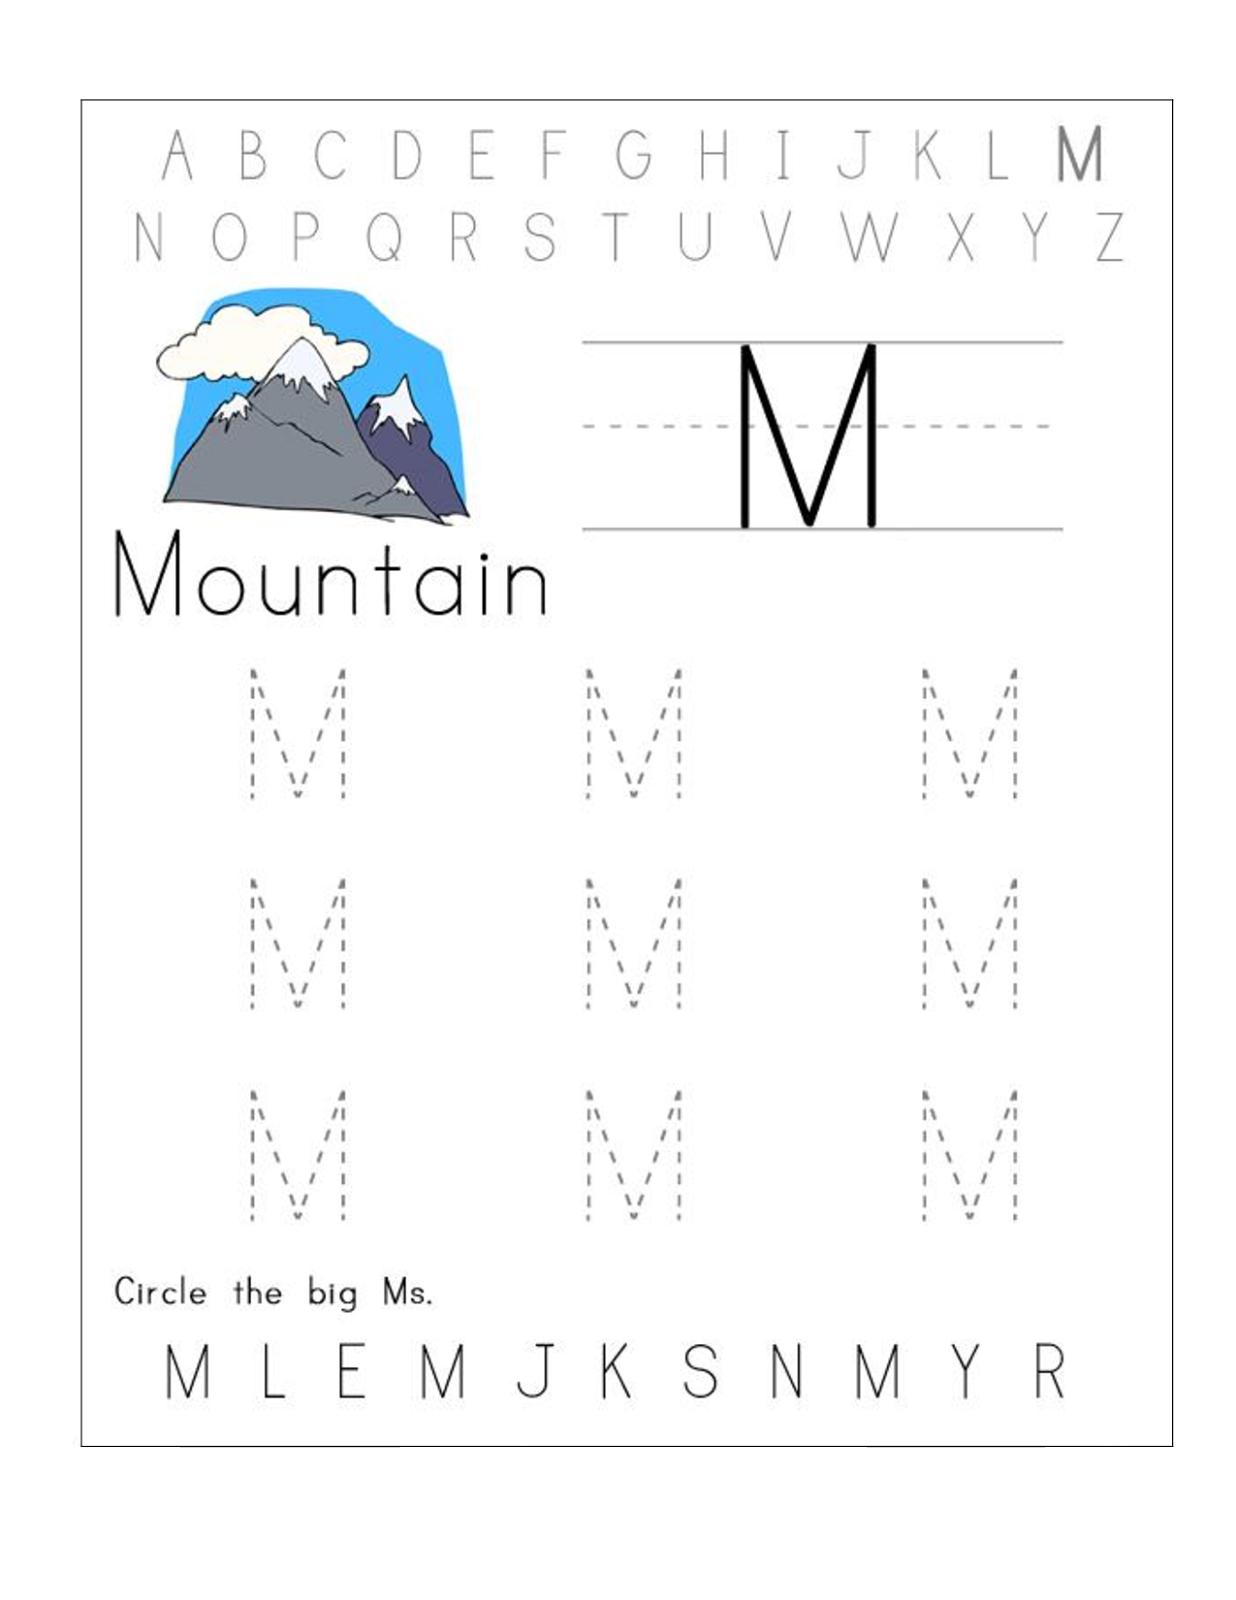 Printable Abc Worksheets Free In